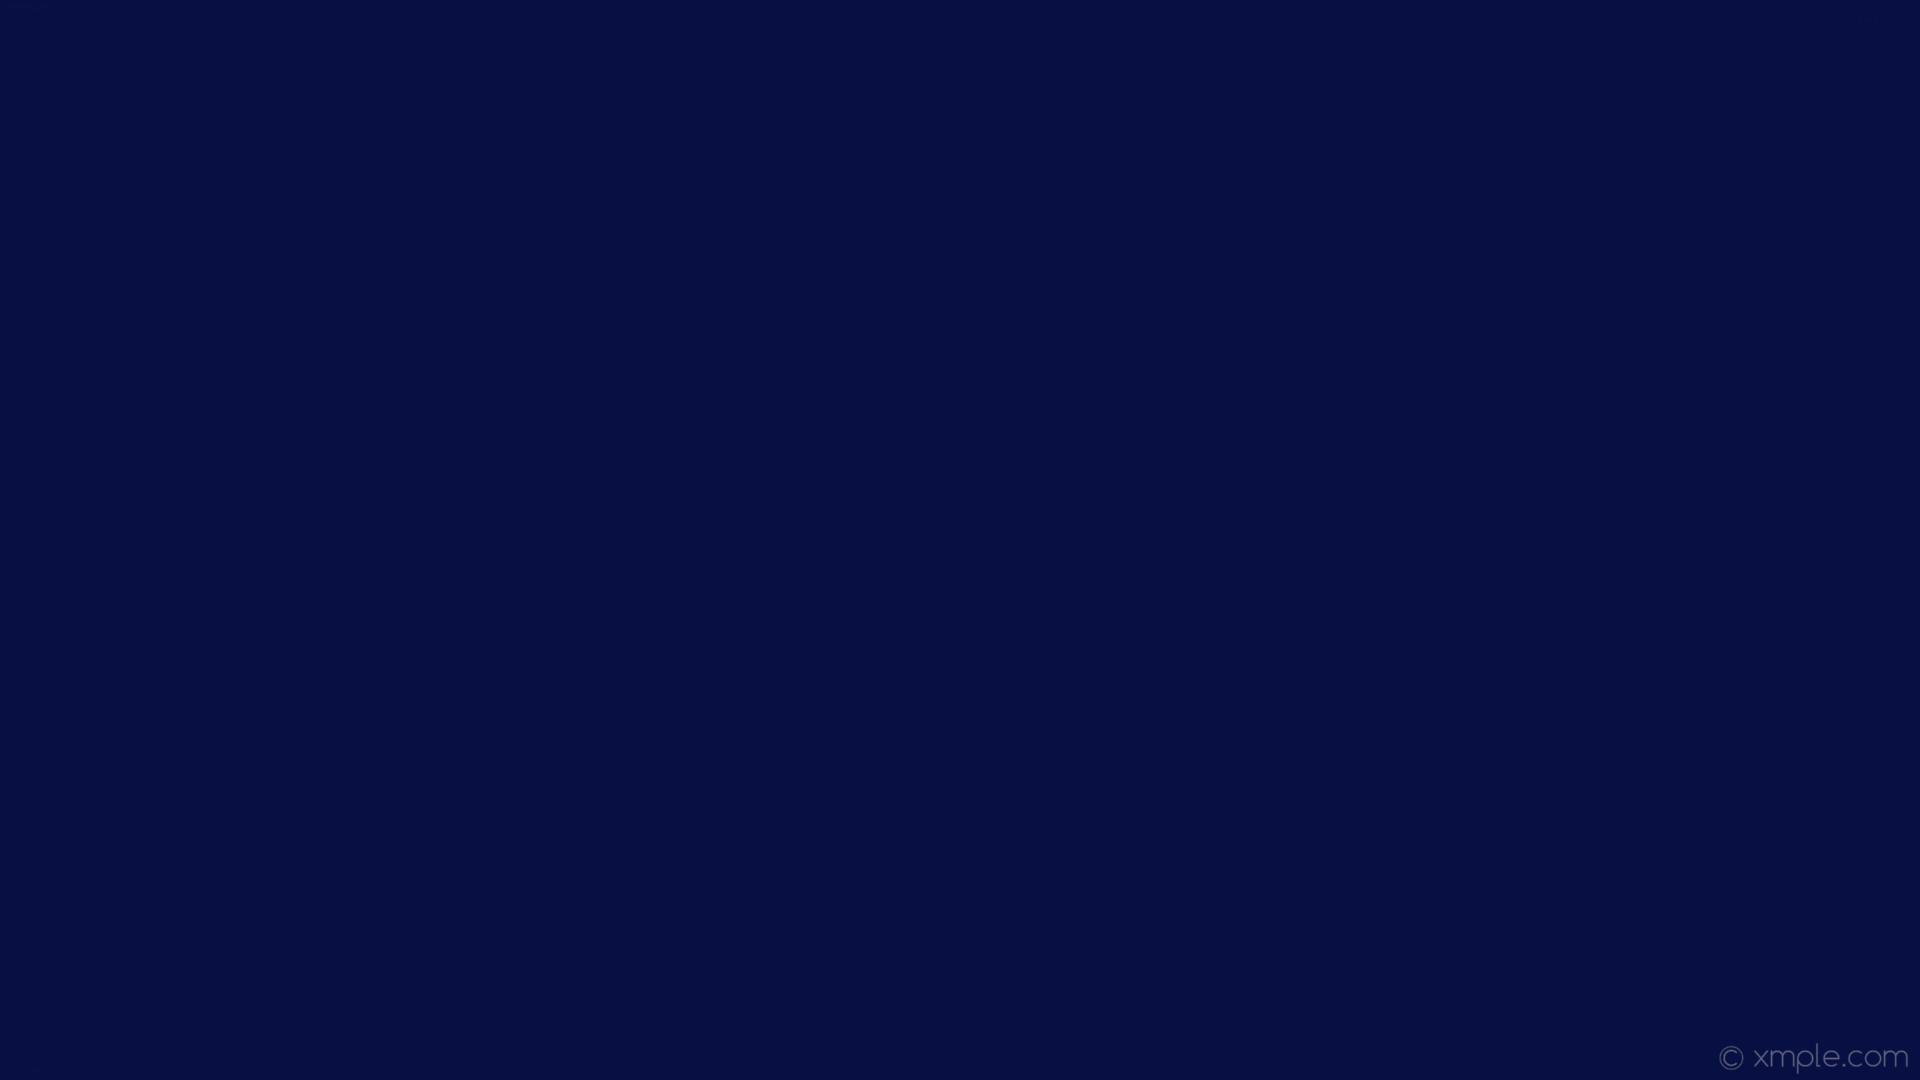 wallpaper solid color one colour single blue plain dark blue #070f43